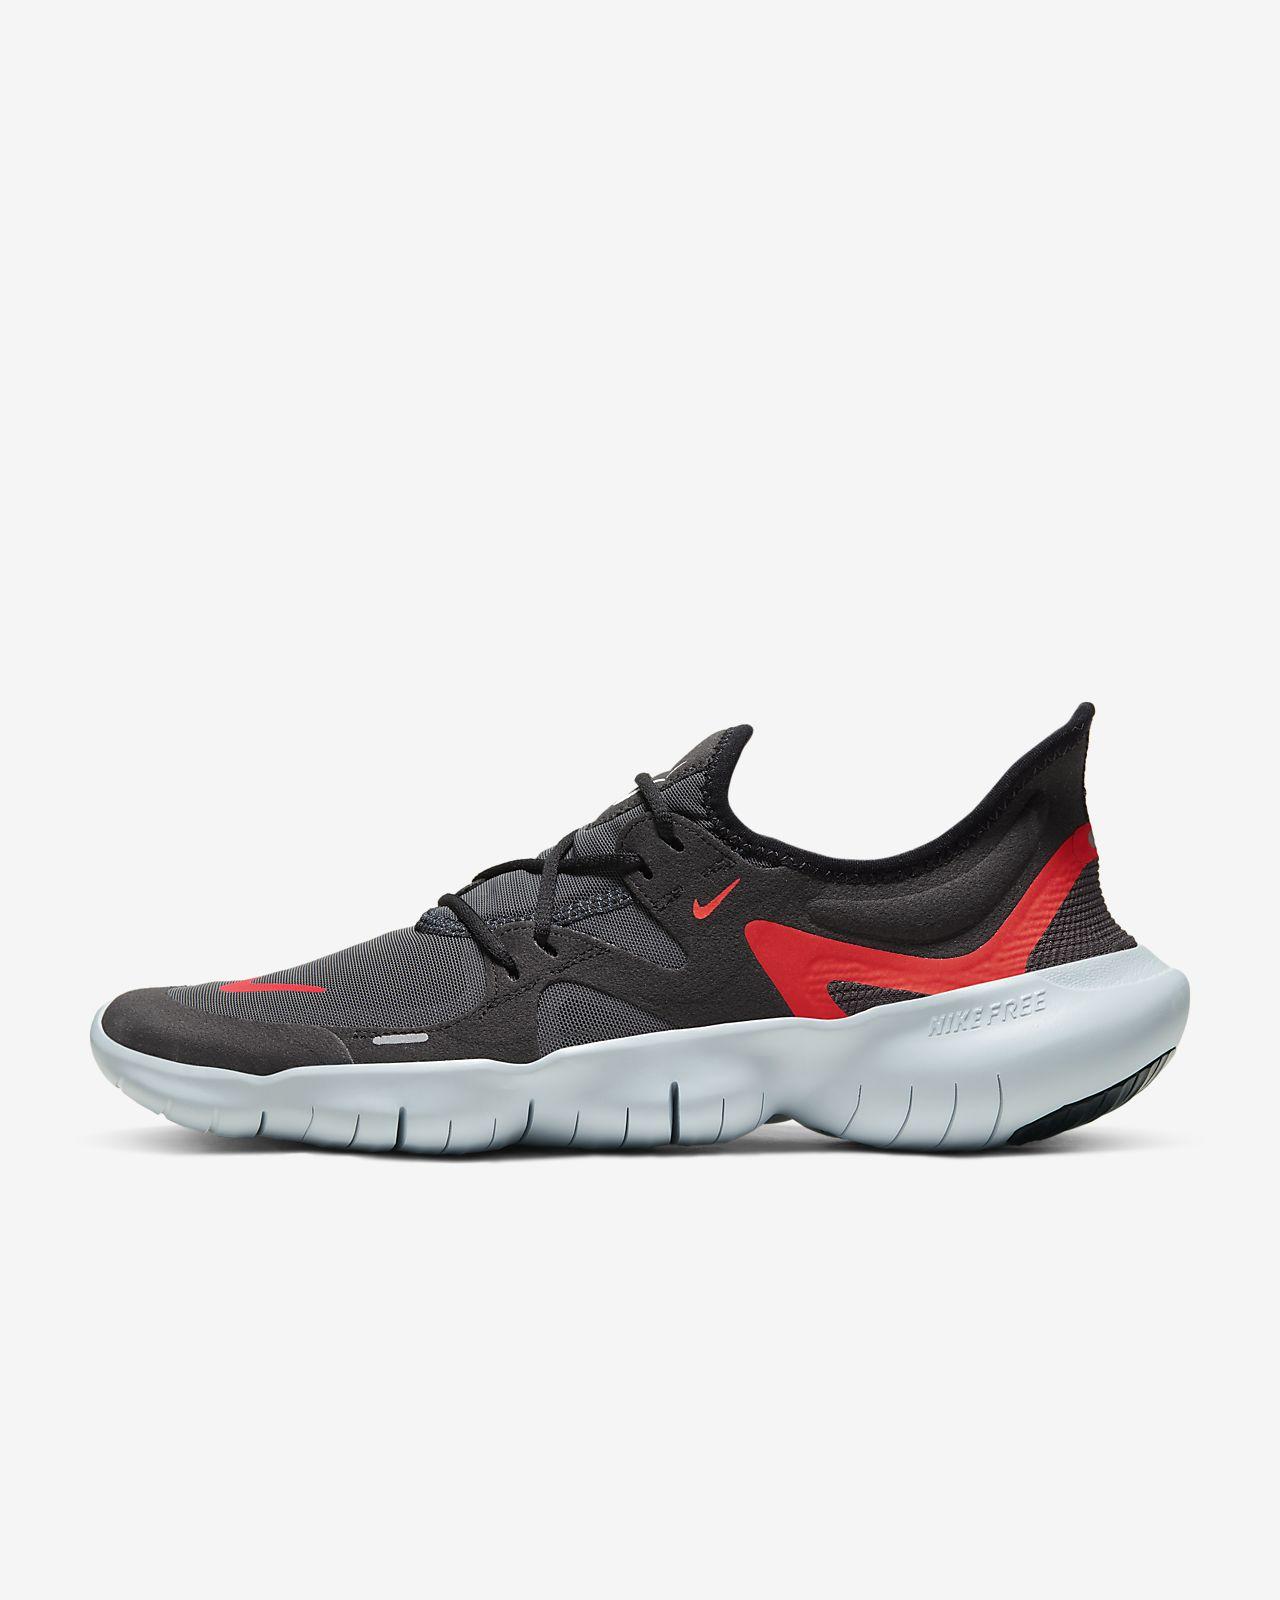 Nike Free 5.0 Premium Schwarz Rot Herren Sneakers Kaufen